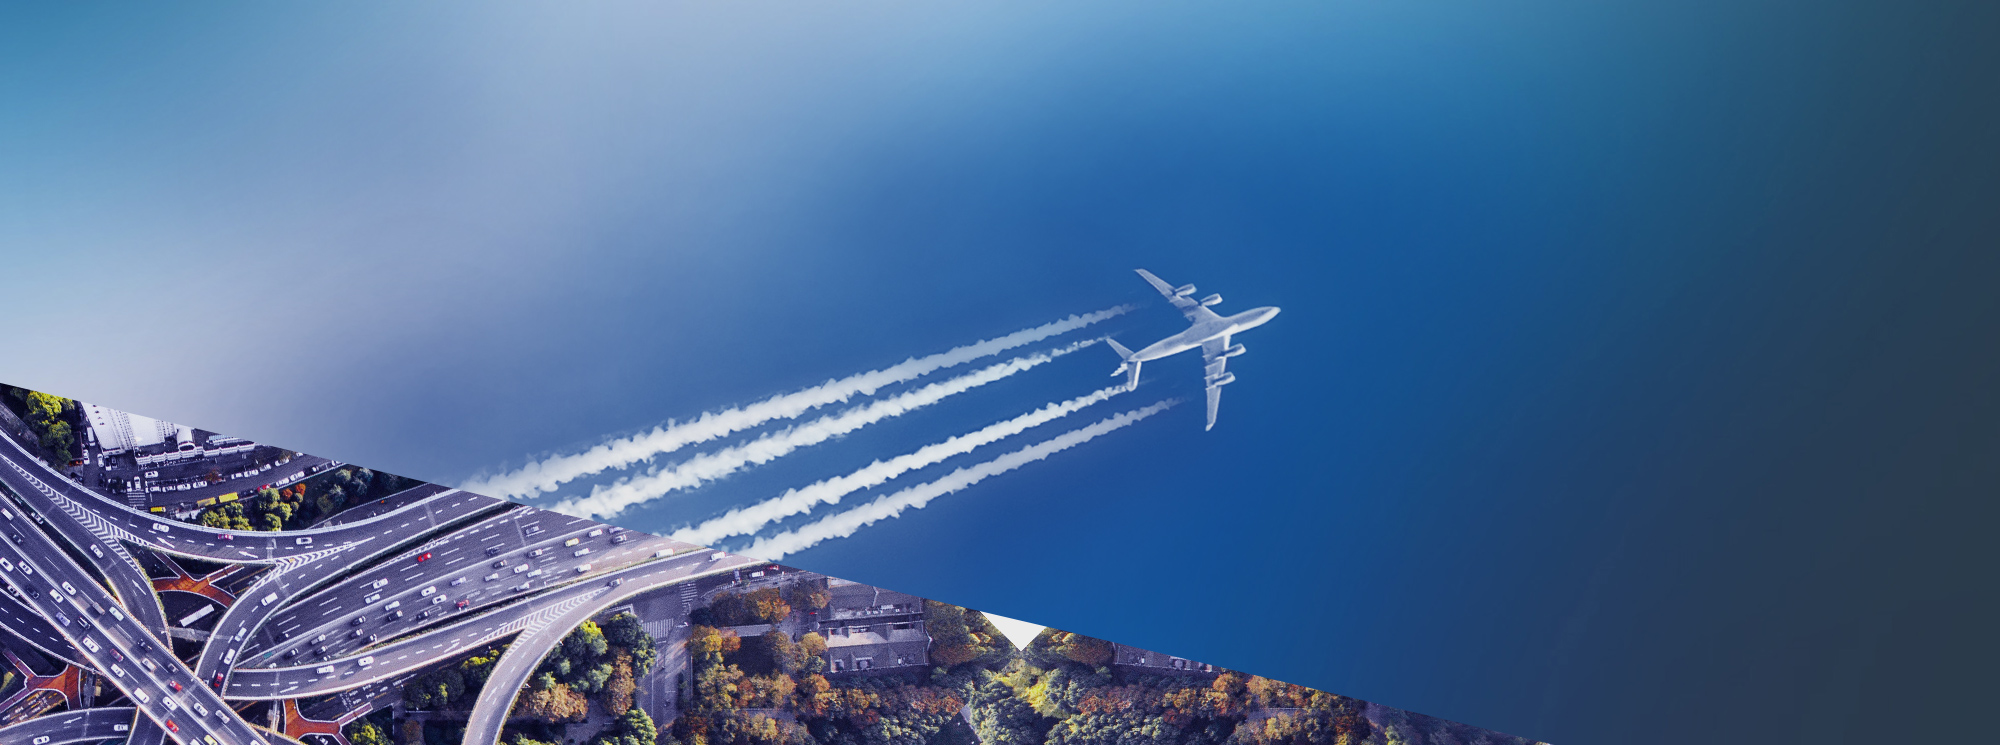 BP Brand Boost Homepage Brand Canvas - Highway/Airplane